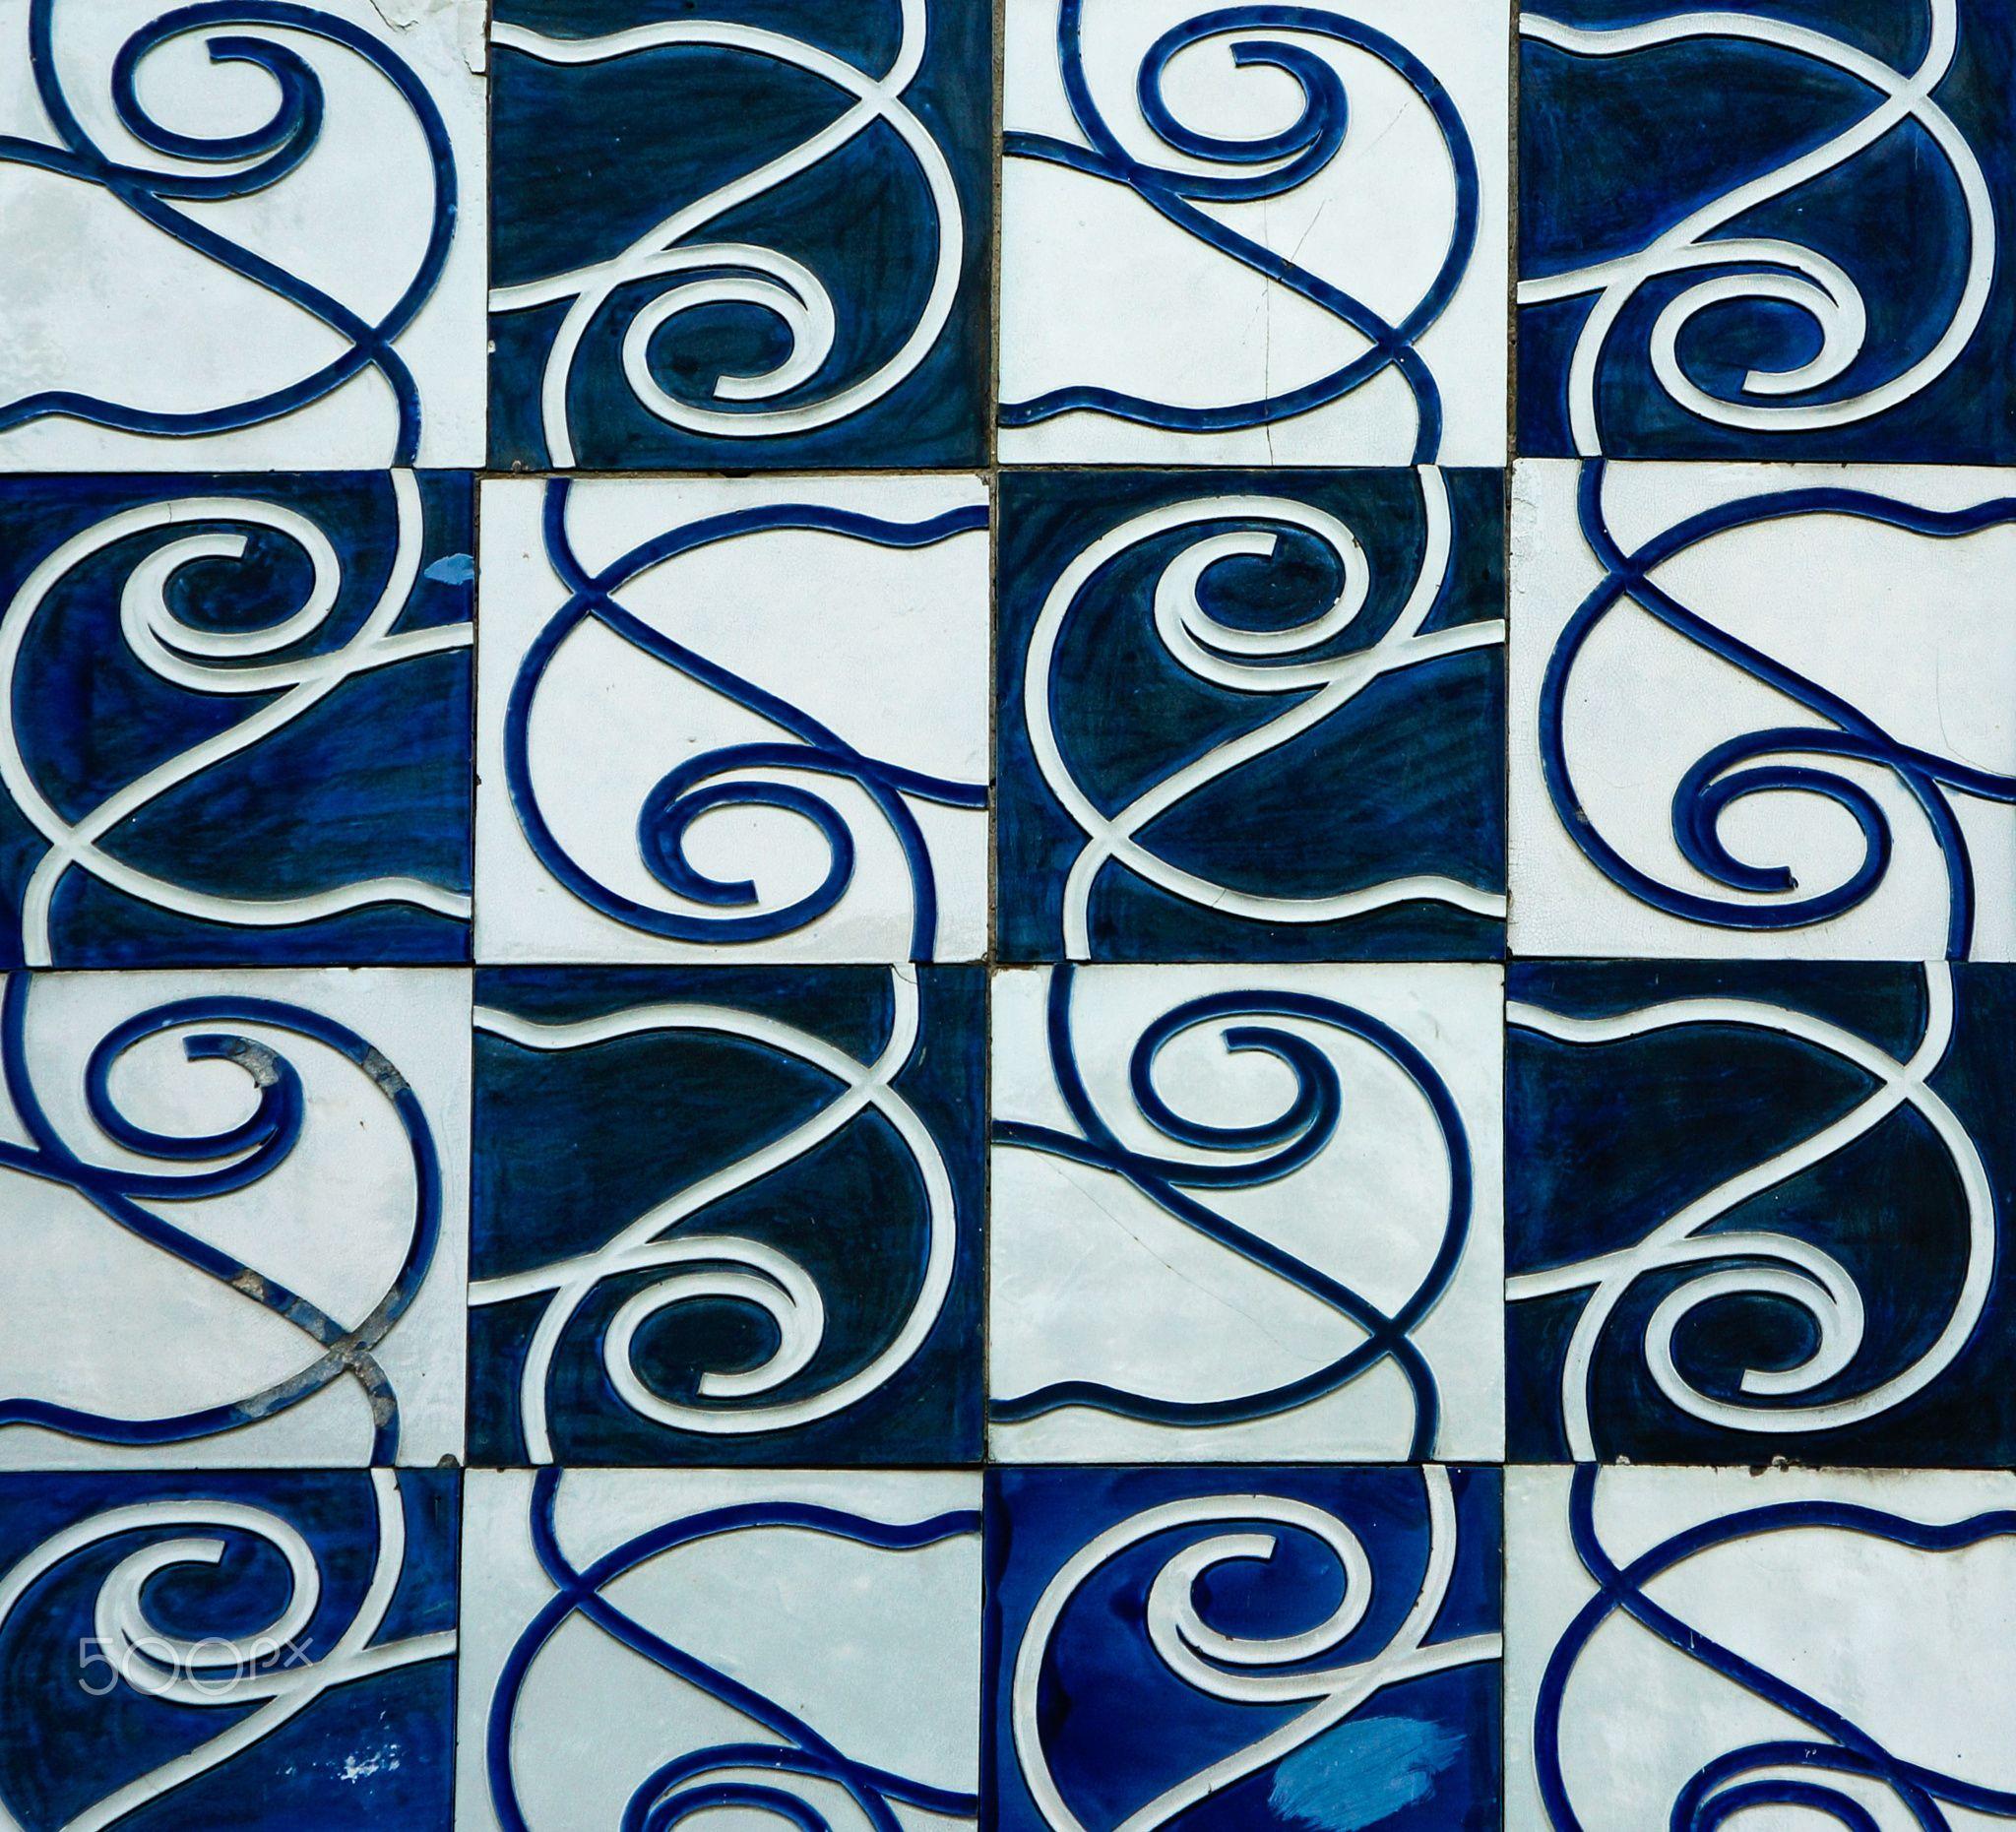 Matthias zabanski art nouveau ceramic tile darmstadt fliesenfries matthias zabanski art nouveau ceramic tile darmstadt fliesenfries olbrichhaus dailygadgetfo Gallery